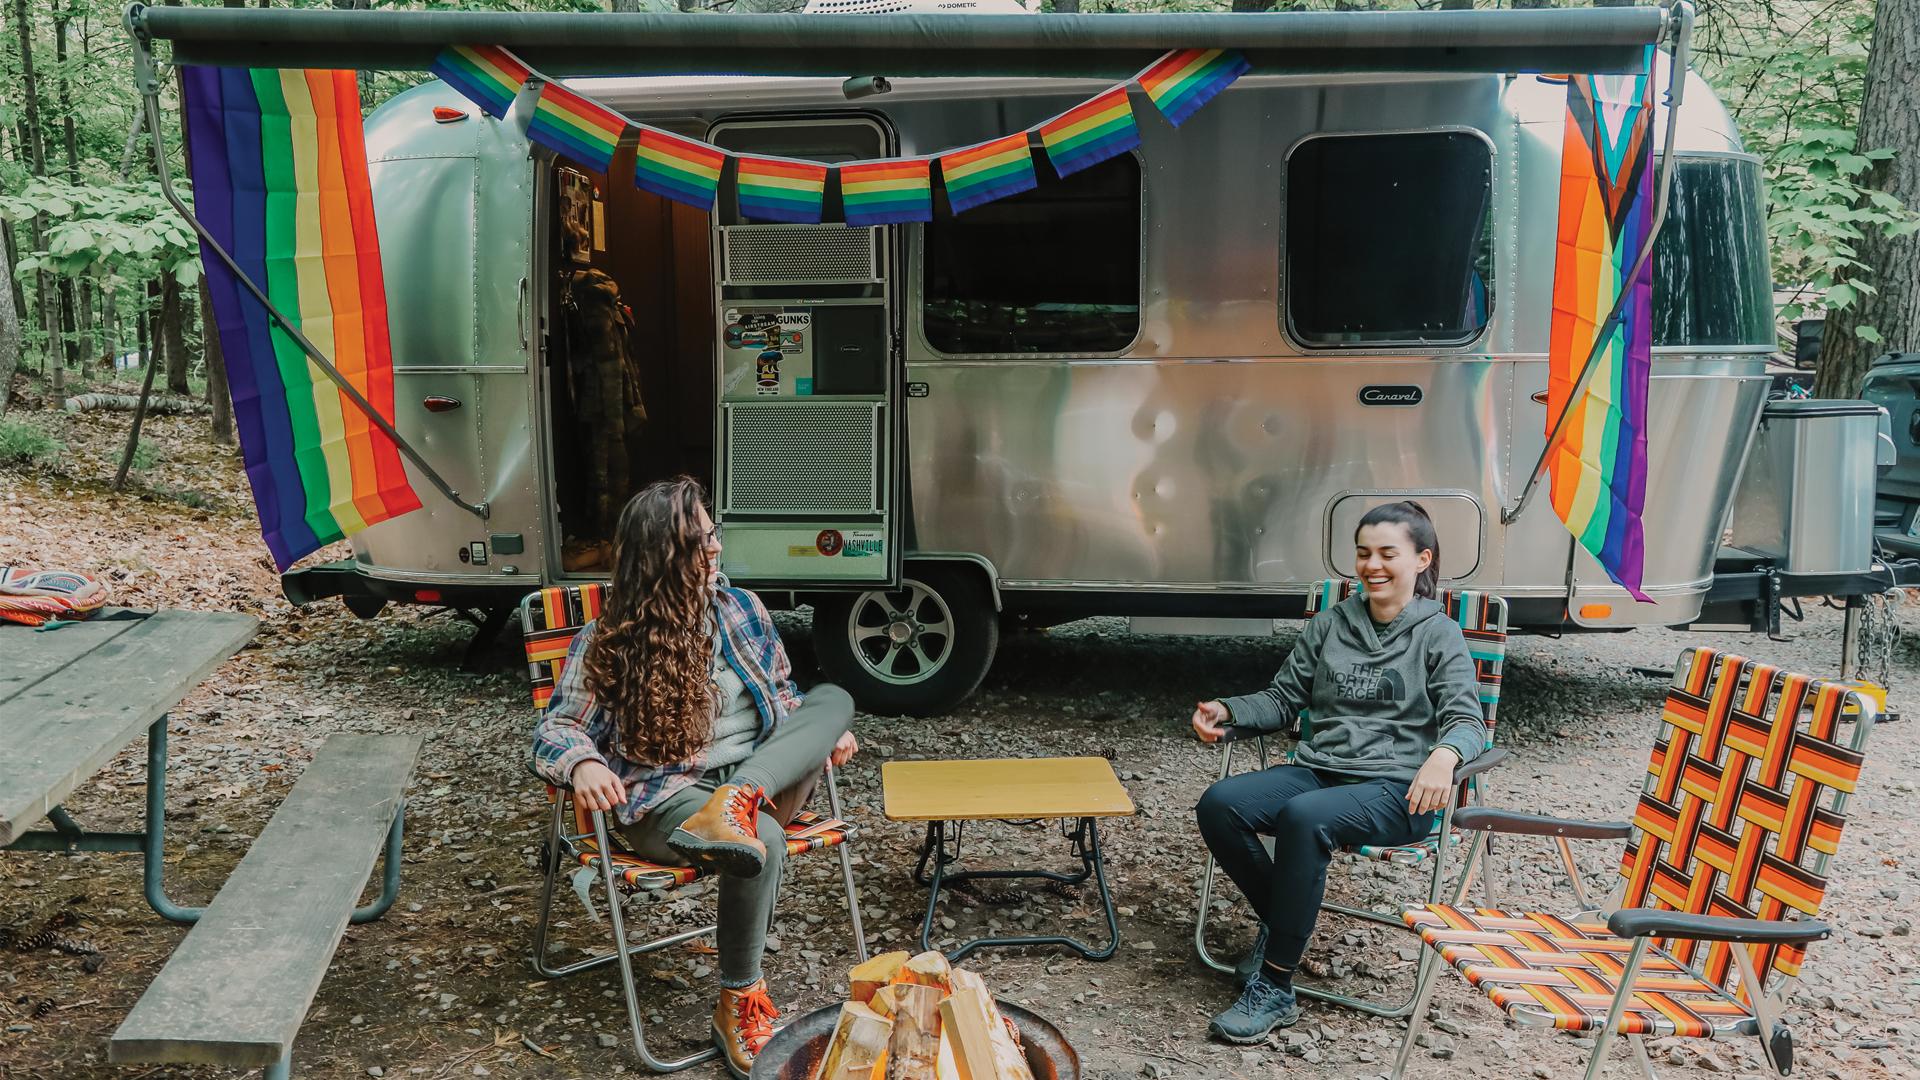 Airstream Ambassador Marisa and her girlfriend sitting outside of her Airstream Travel Trailer